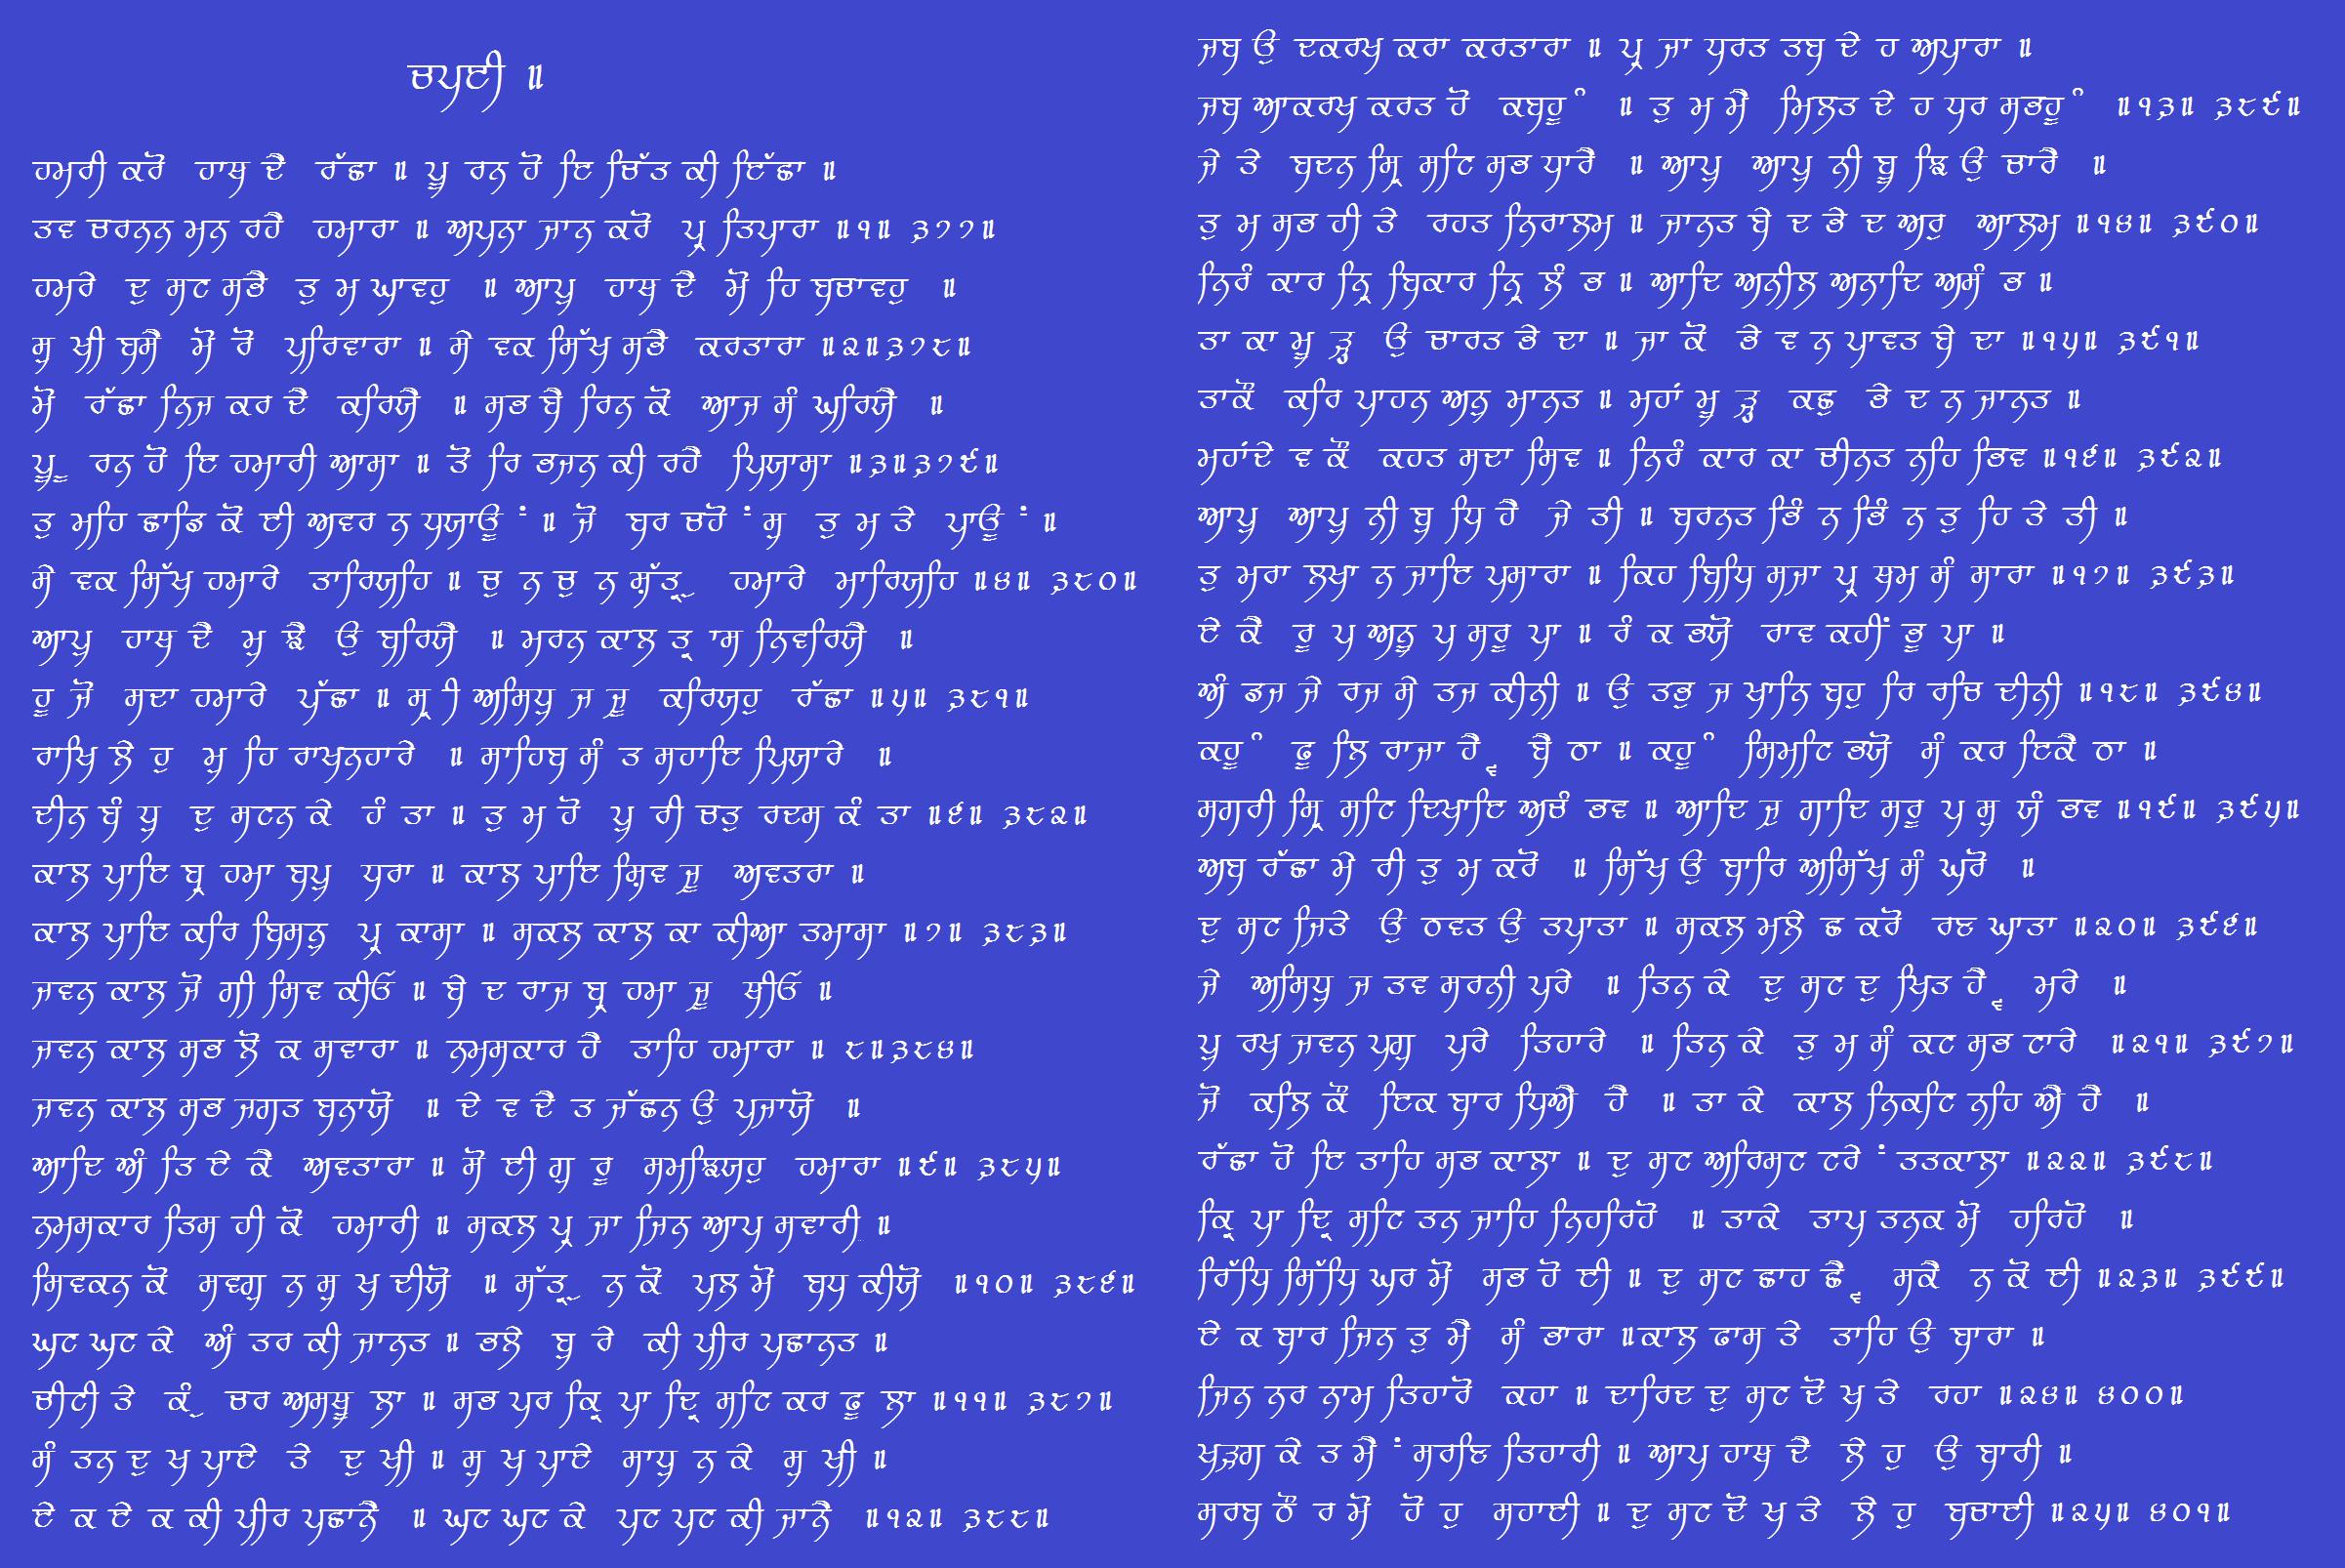 Choapi Guru Gobind Singh Dasam Granth prayer text.